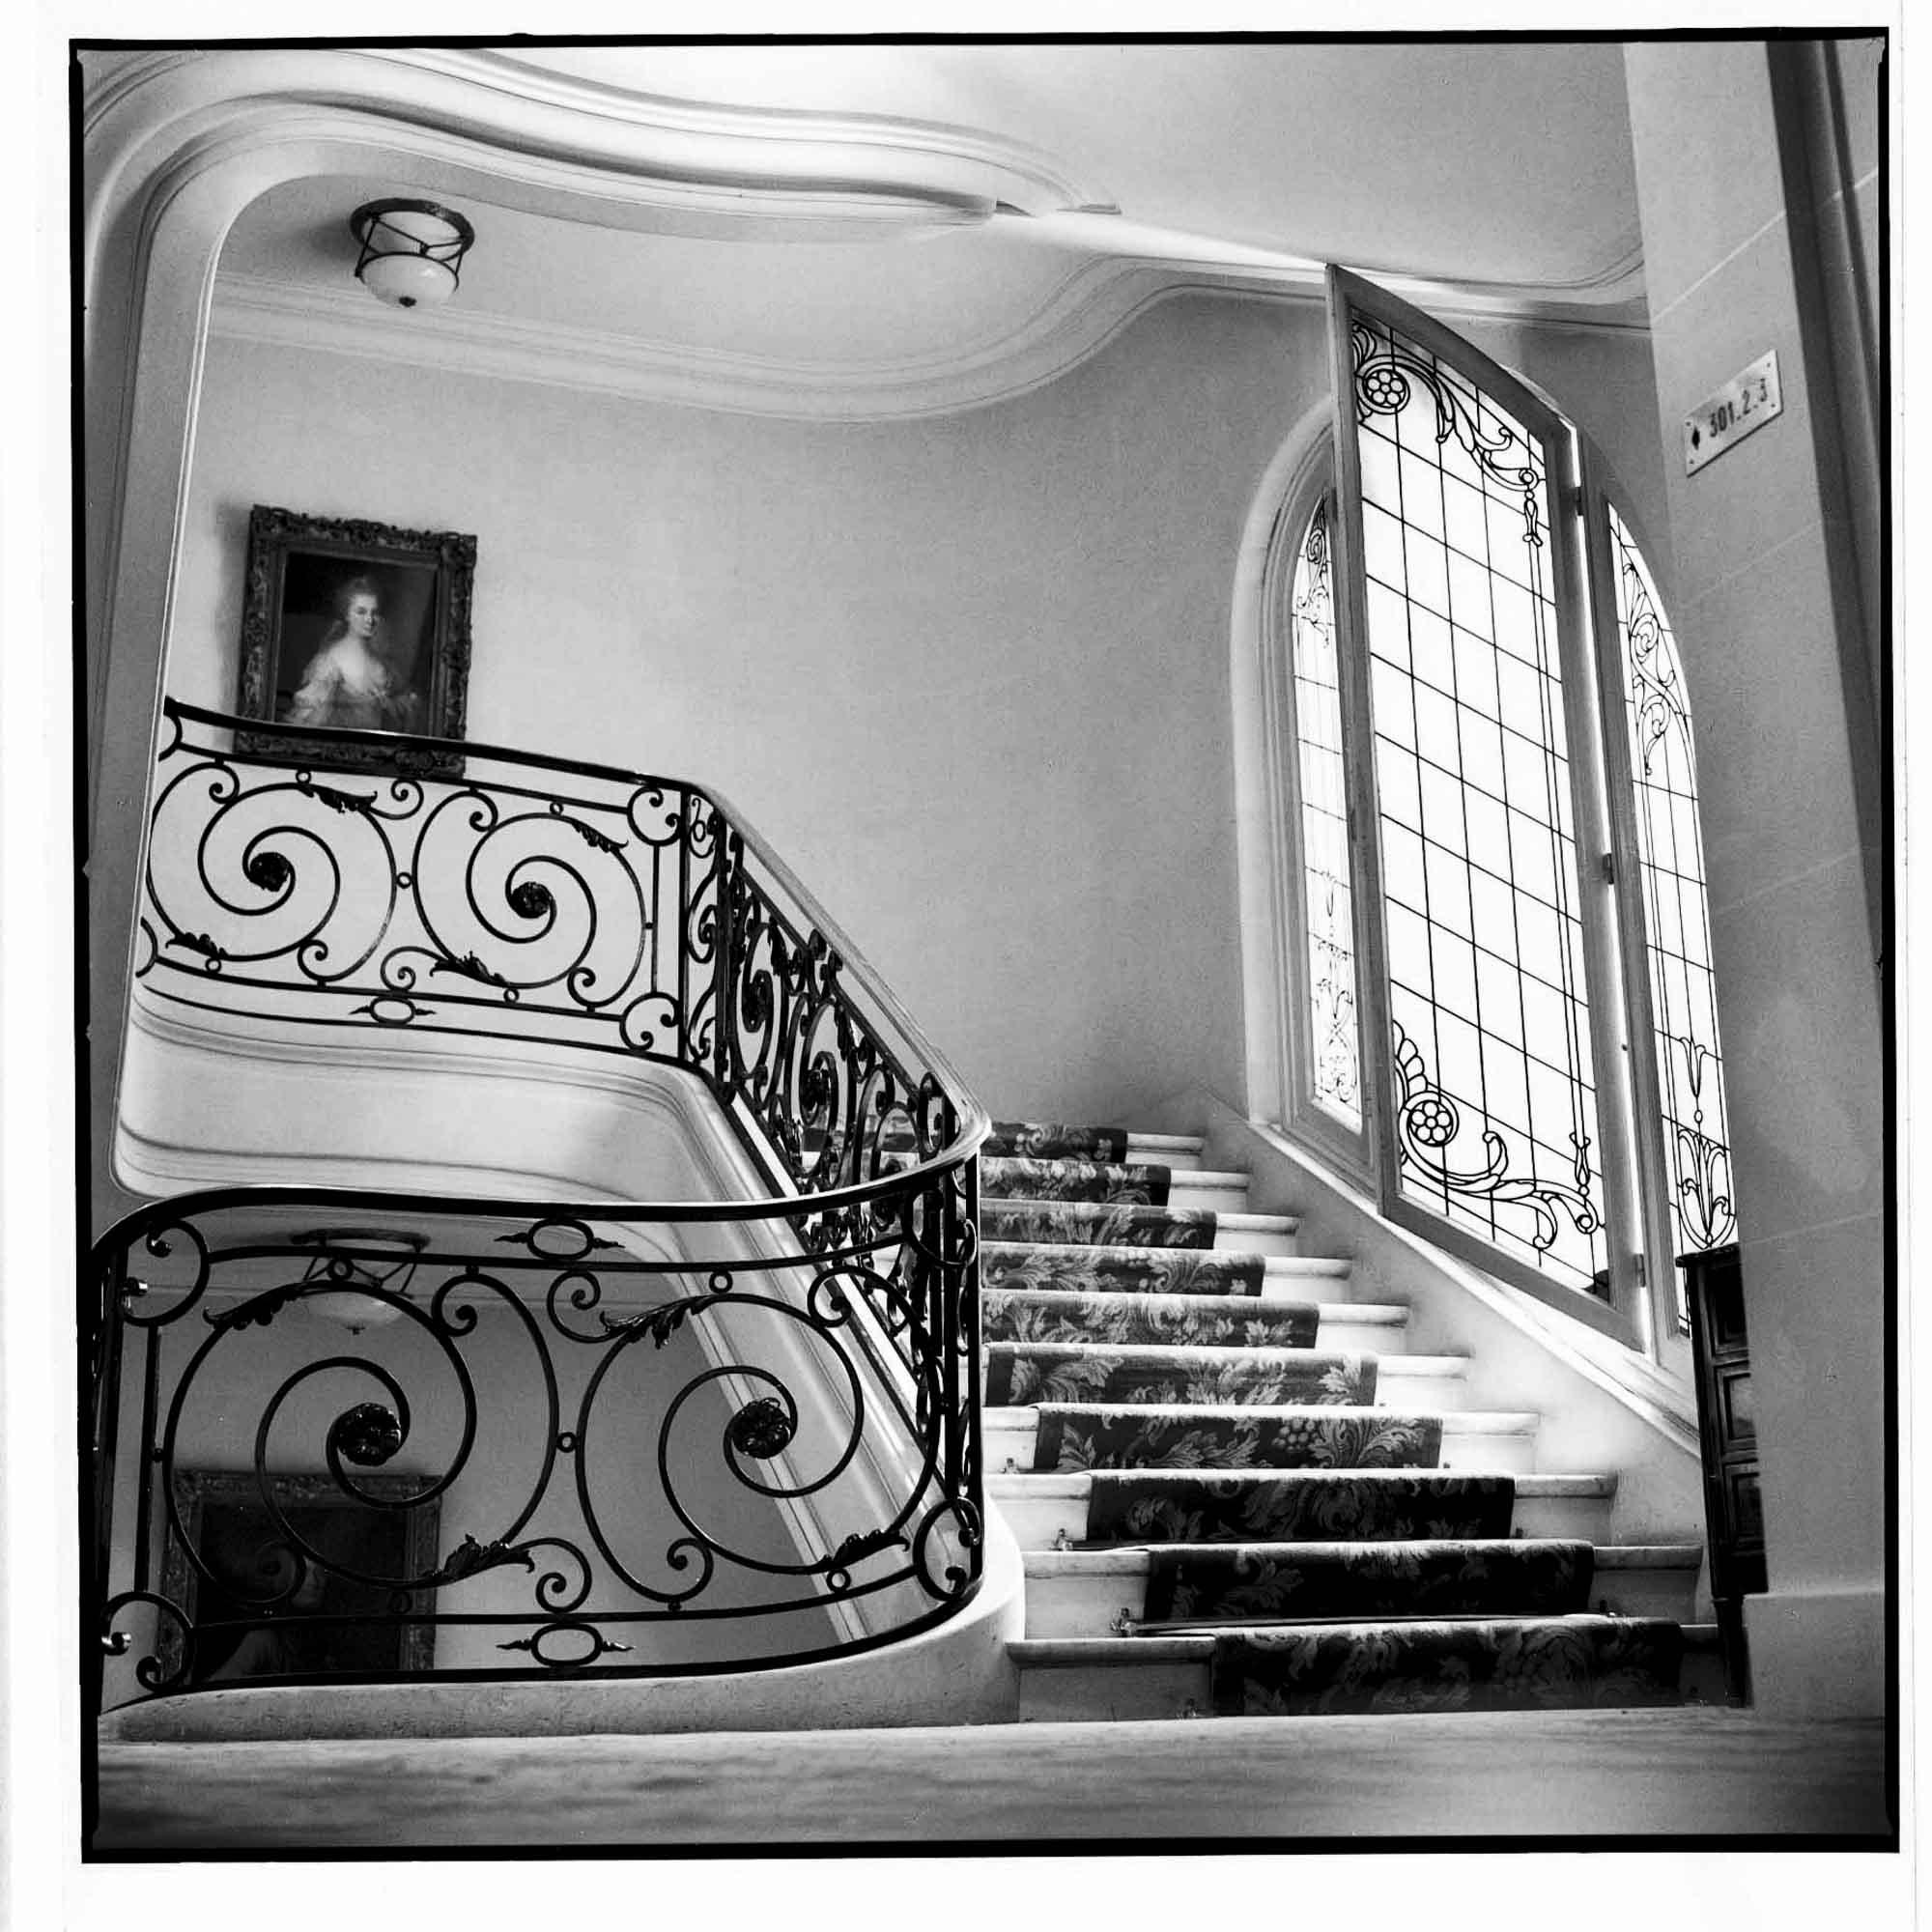 WilliamHeydt-Photographs-C3437-6.jpg